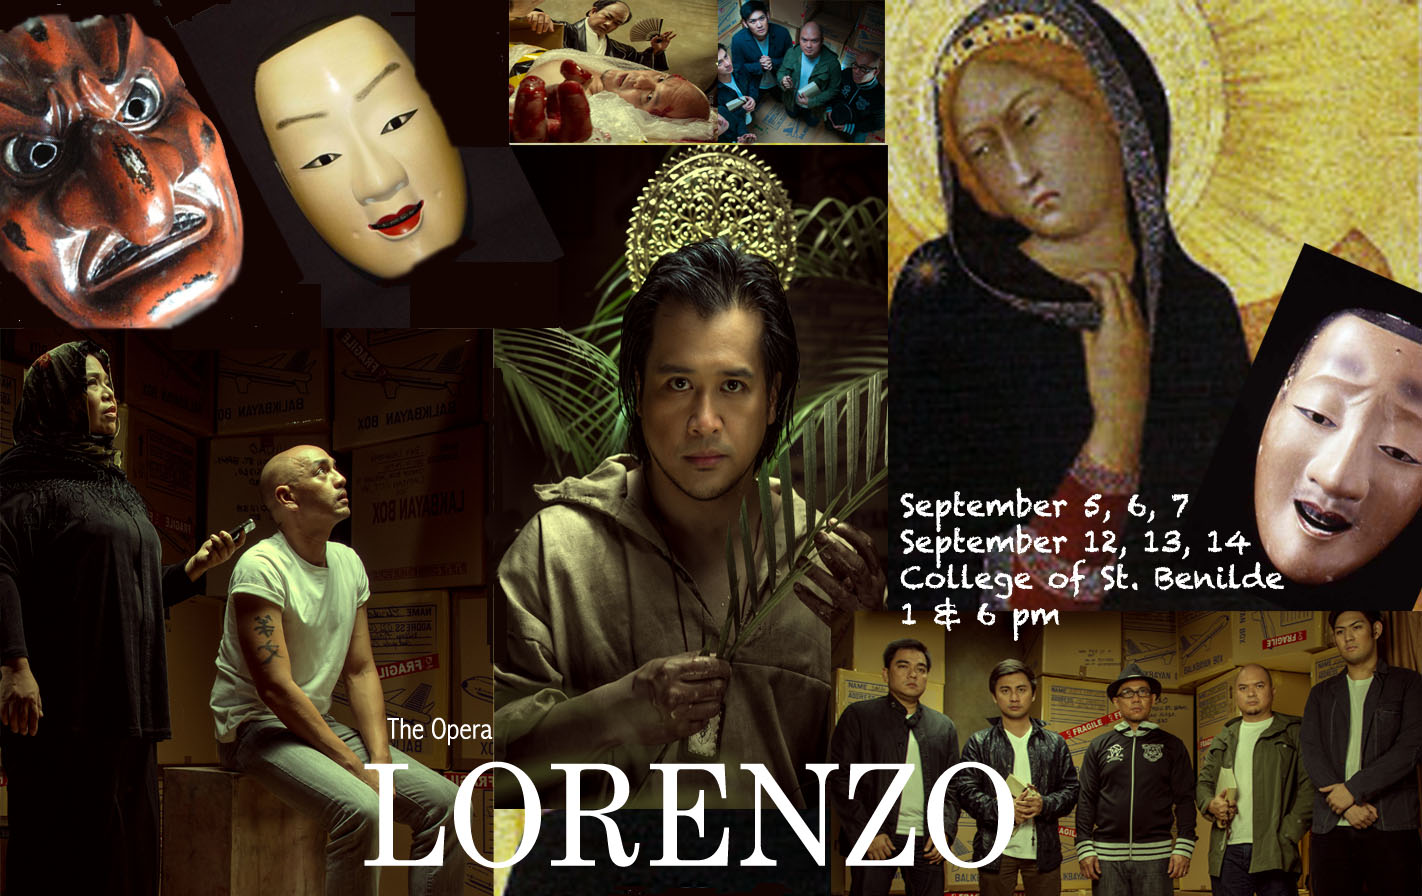 Lorenzo poster